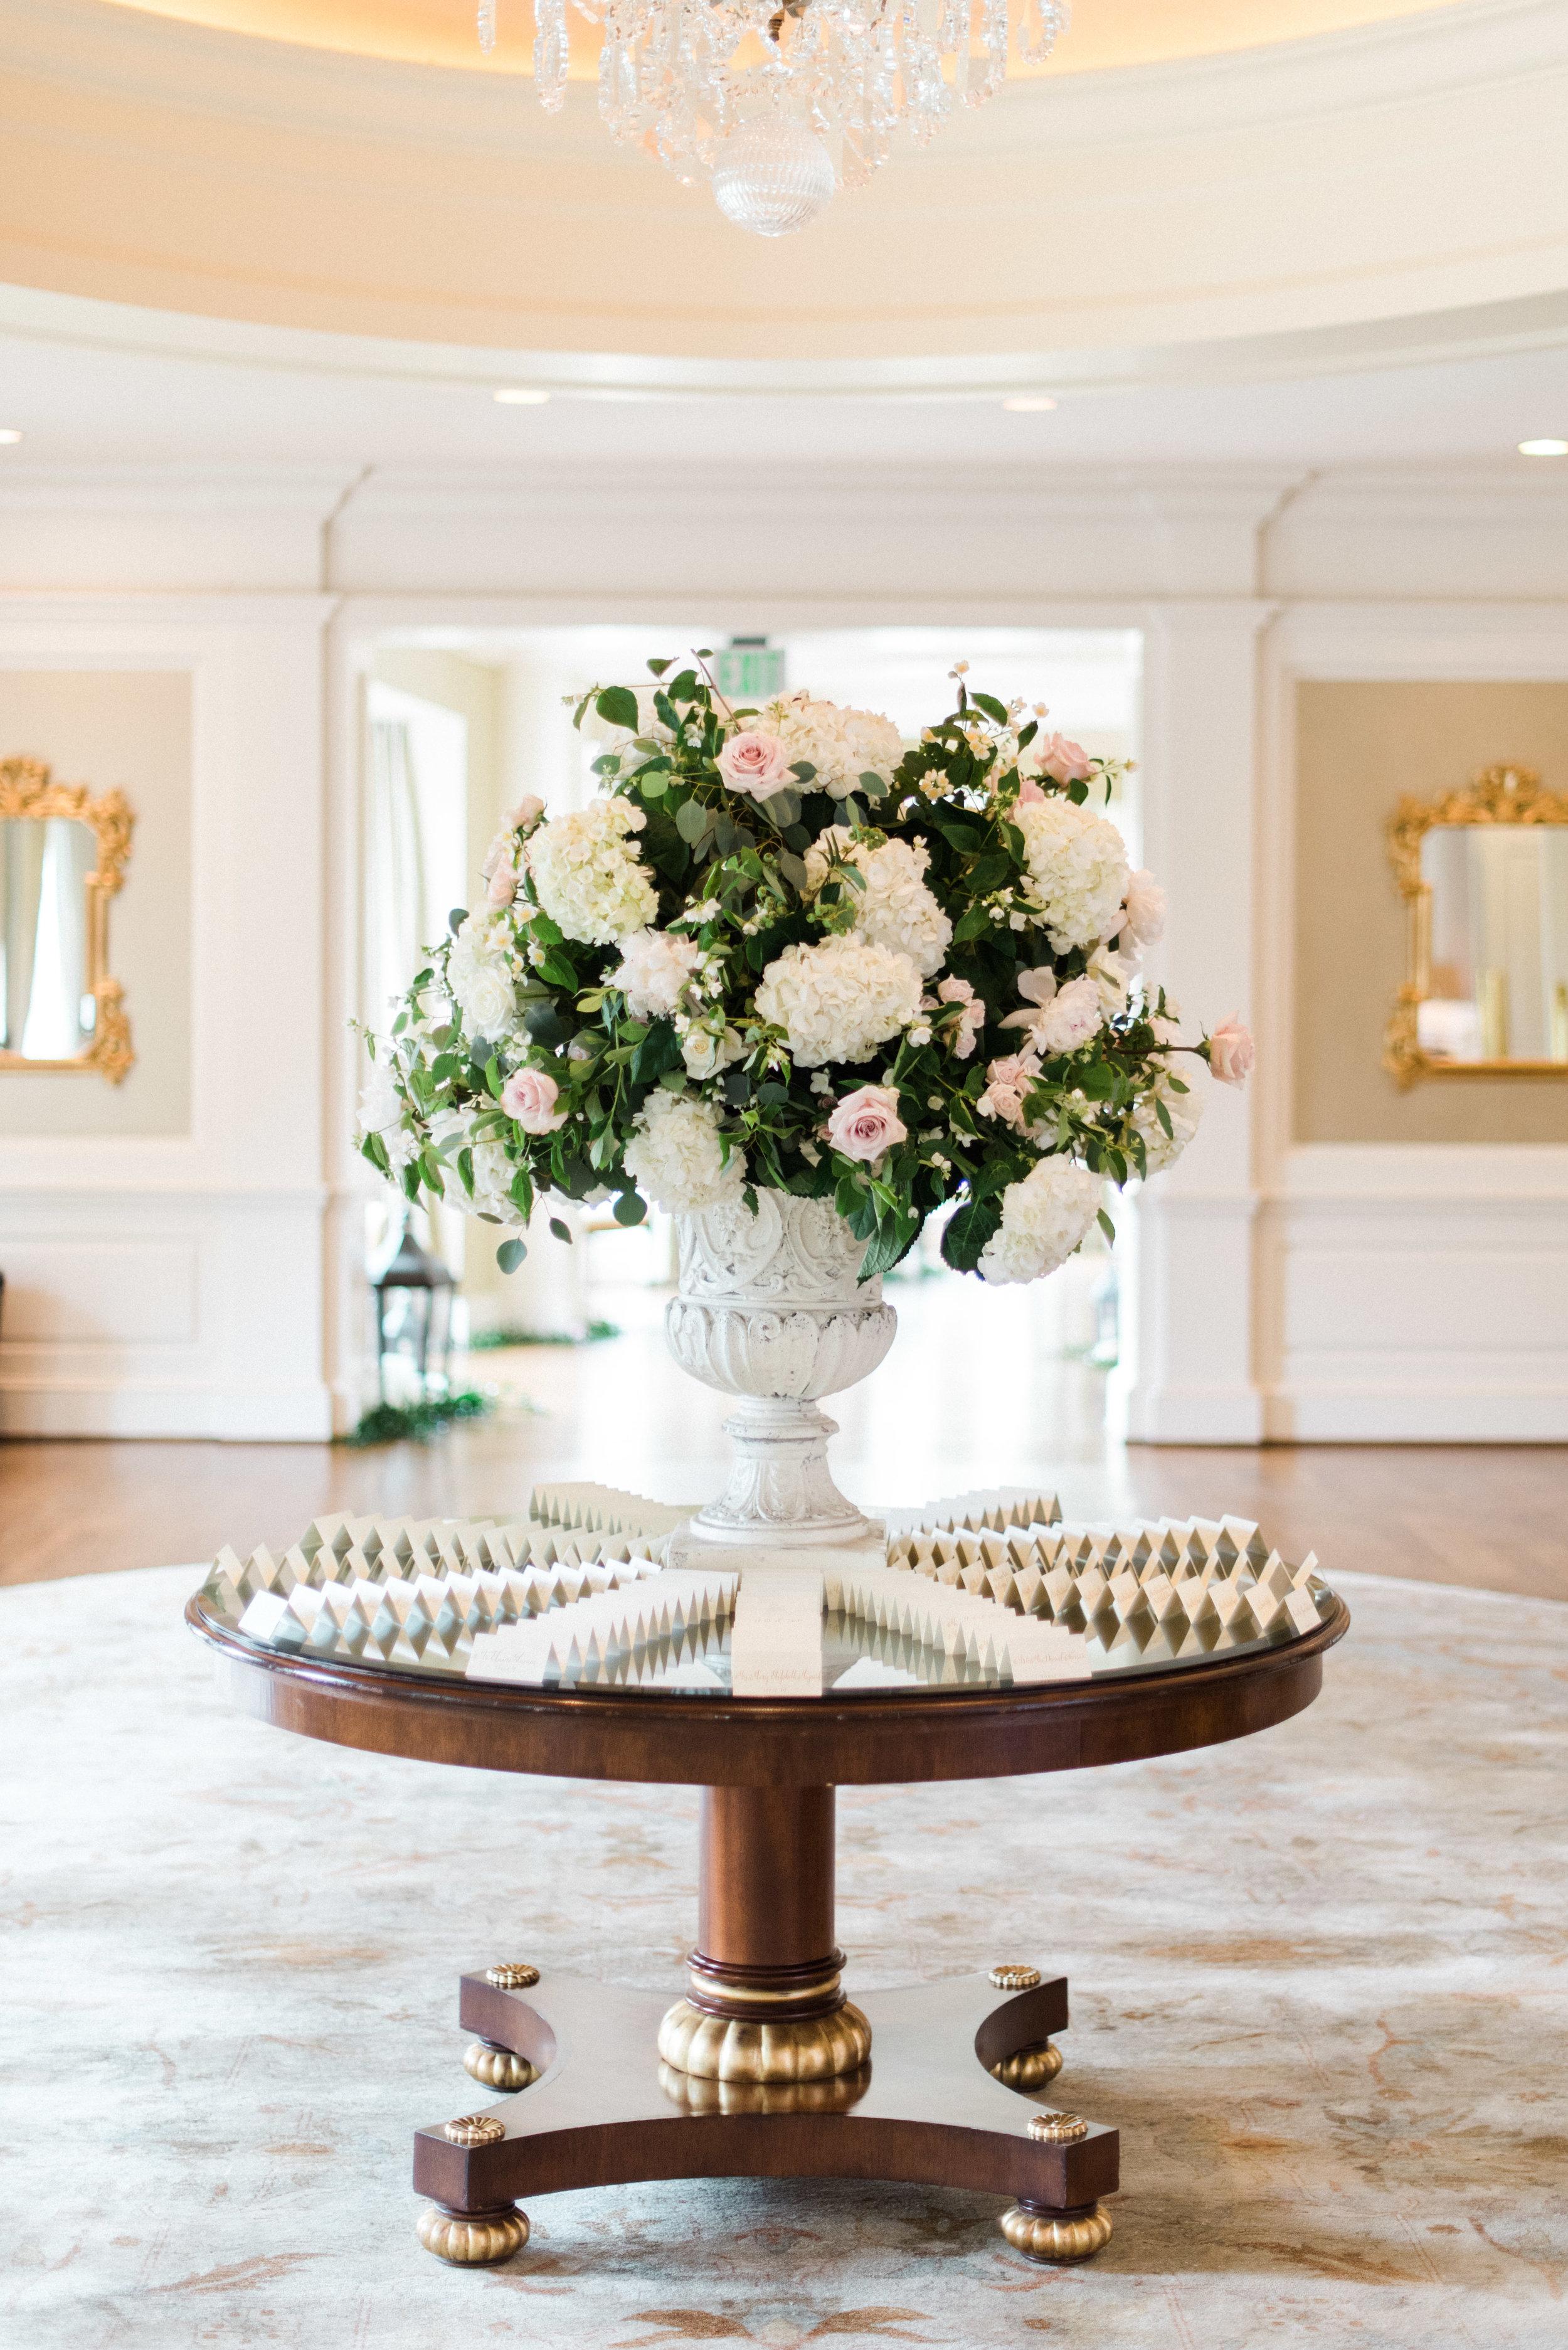 River-Oaks-Country-Club-Wedding-Venue-Photographer-Houston-Texas-Fine-Art-Film-Top-Best-Destination-Dana-Fernandez-Photographer-Luxury-101